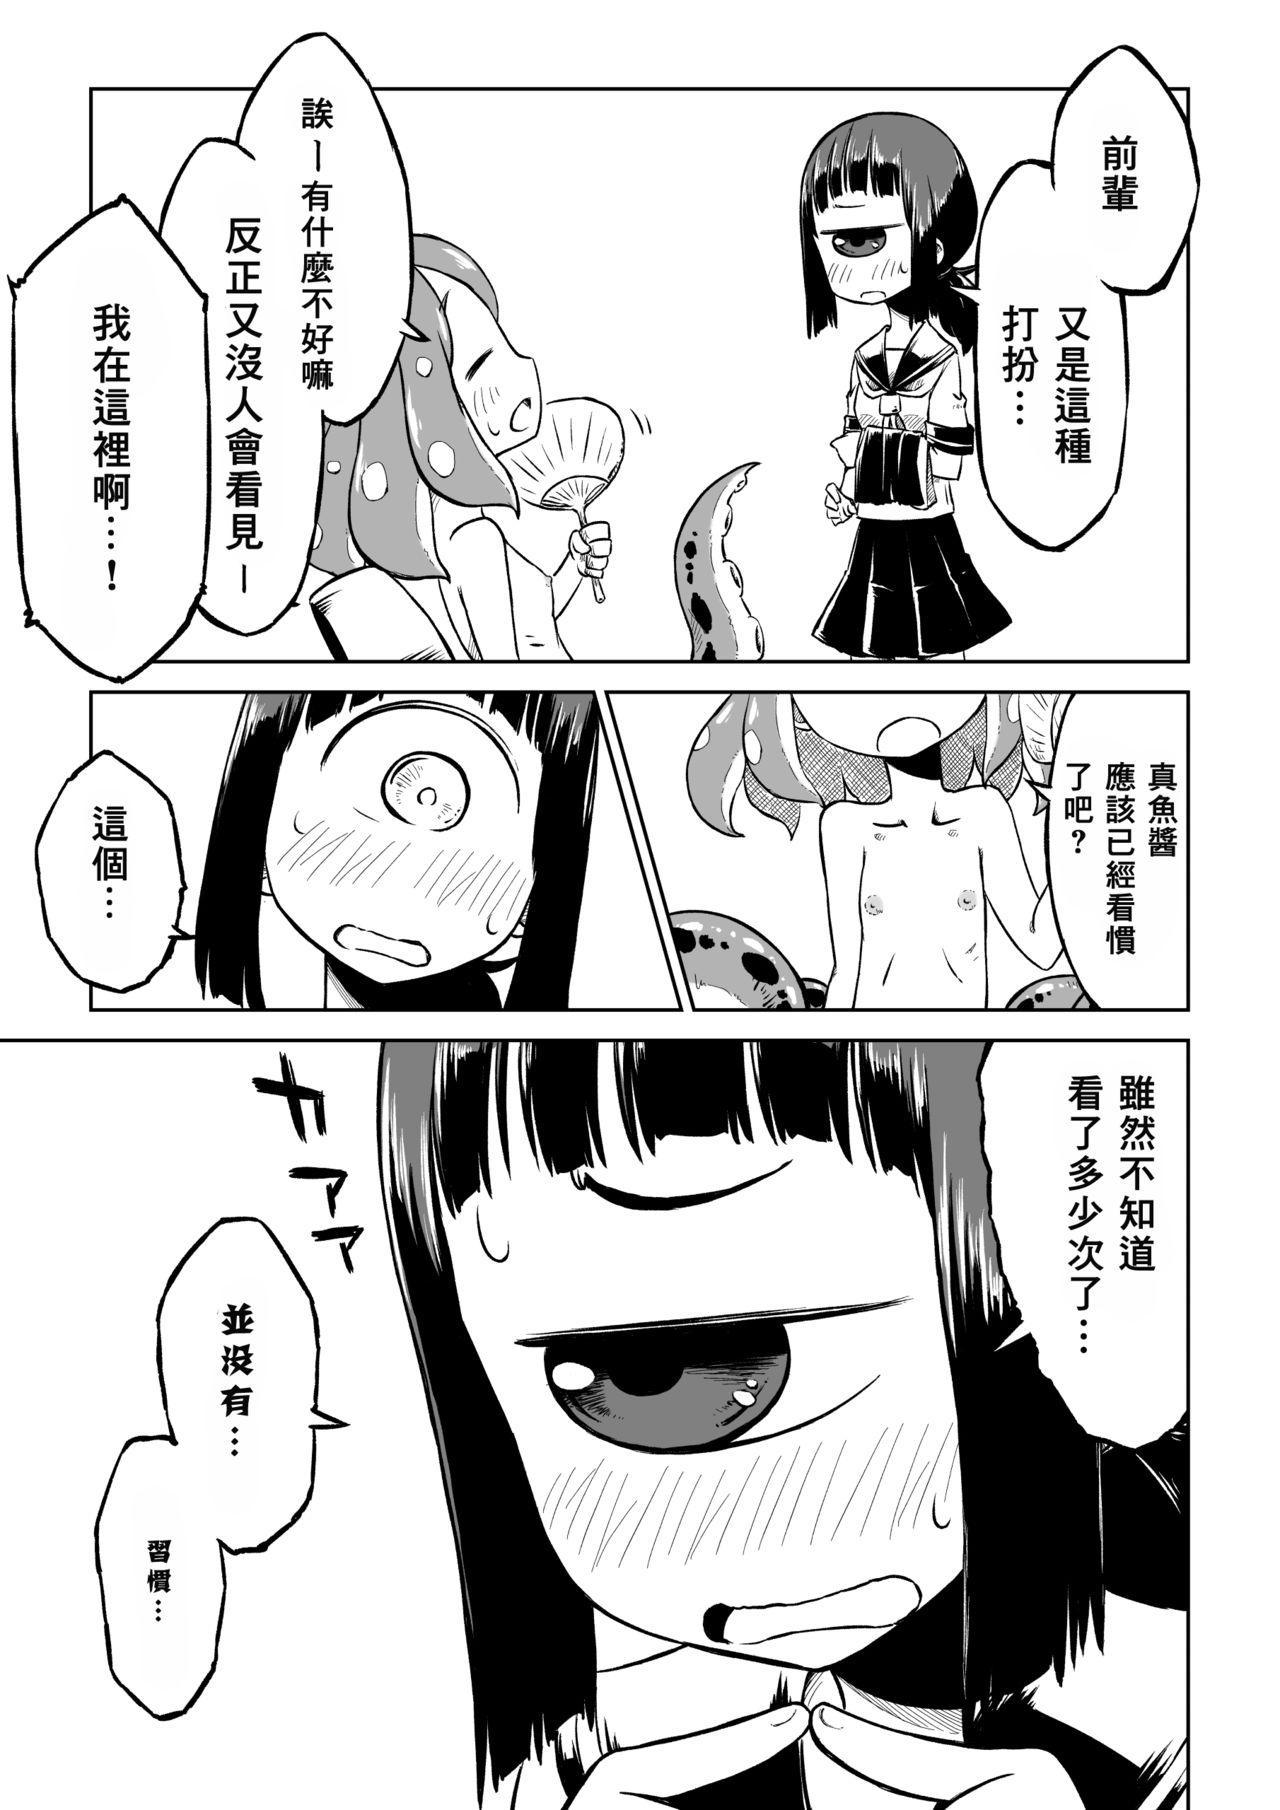 Tako Musume to Tangan Musume ga XX Suru dake. 5